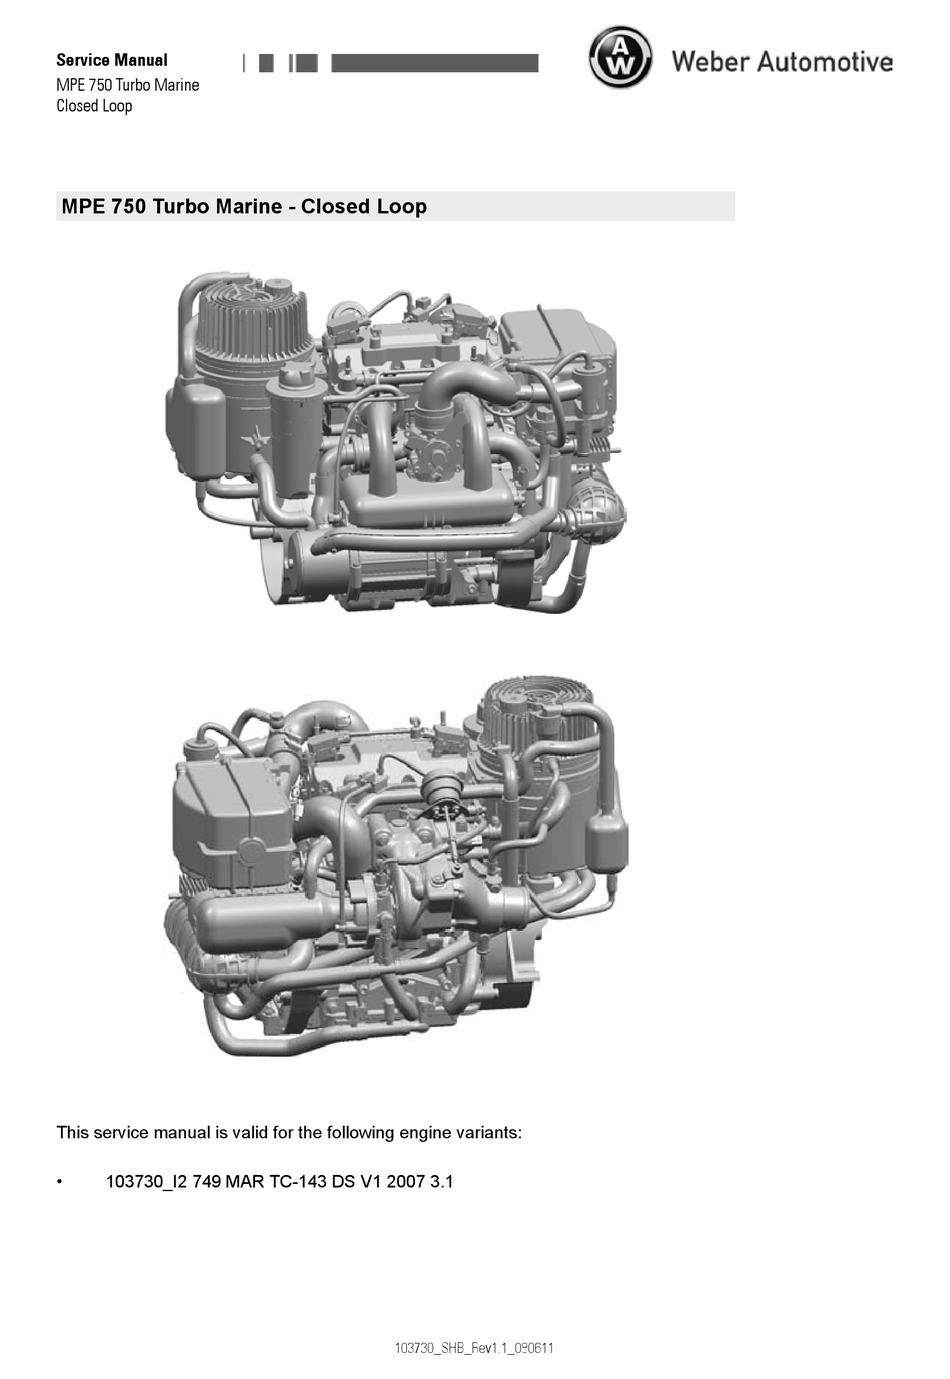 WEBER AUTOMOTIVE MPE 750 TURBO MARINE SERVICE MANUAL Pdf